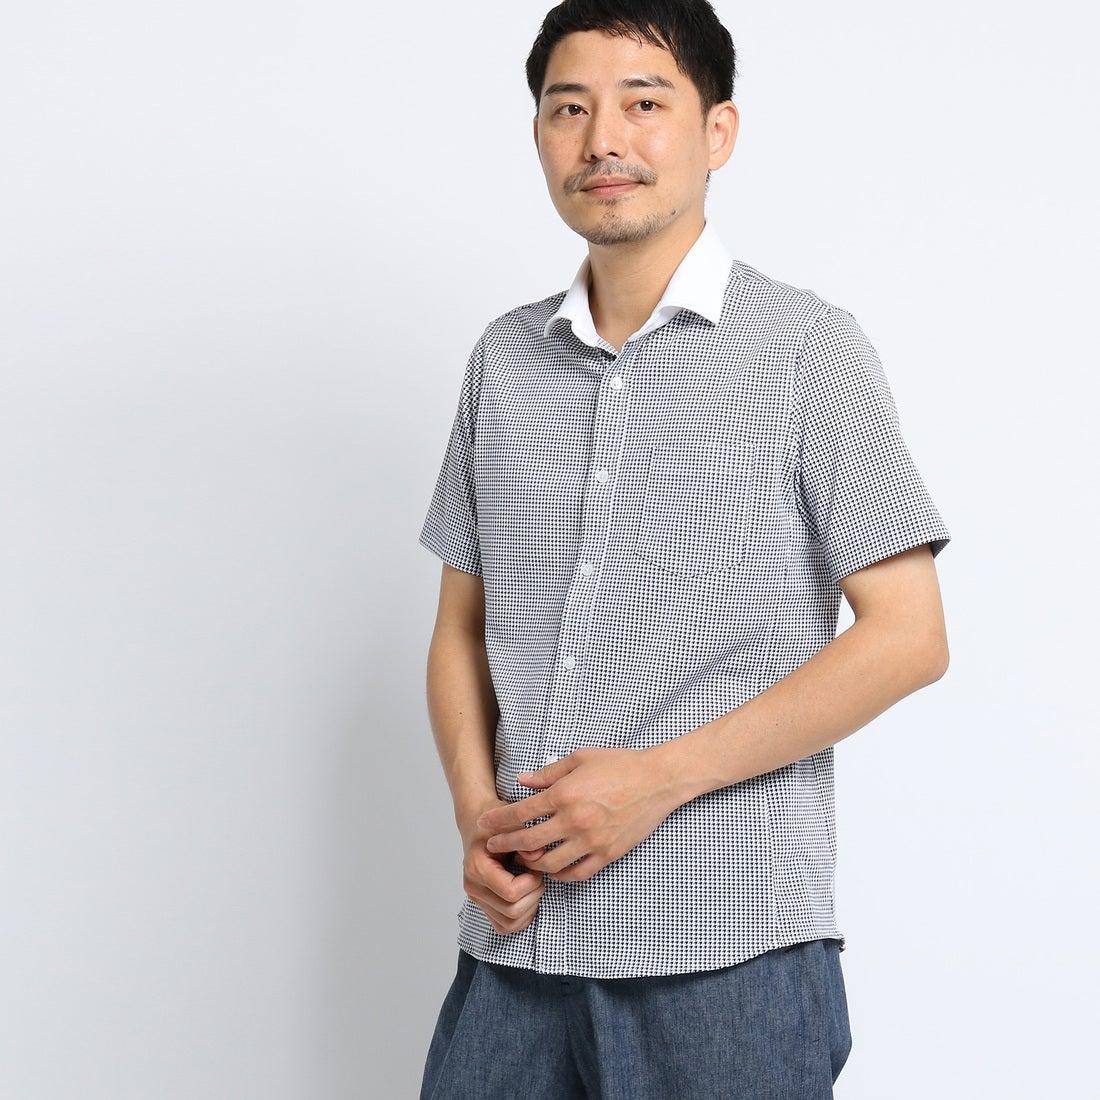 【SALE 30%OFF】タケオ キクチ TAKEO KIKUCHI [TALL&LARGEサイズ]千鳥柄クレリックシャツ [ メンズ クールマックス クールビズ ] (ホワイト)